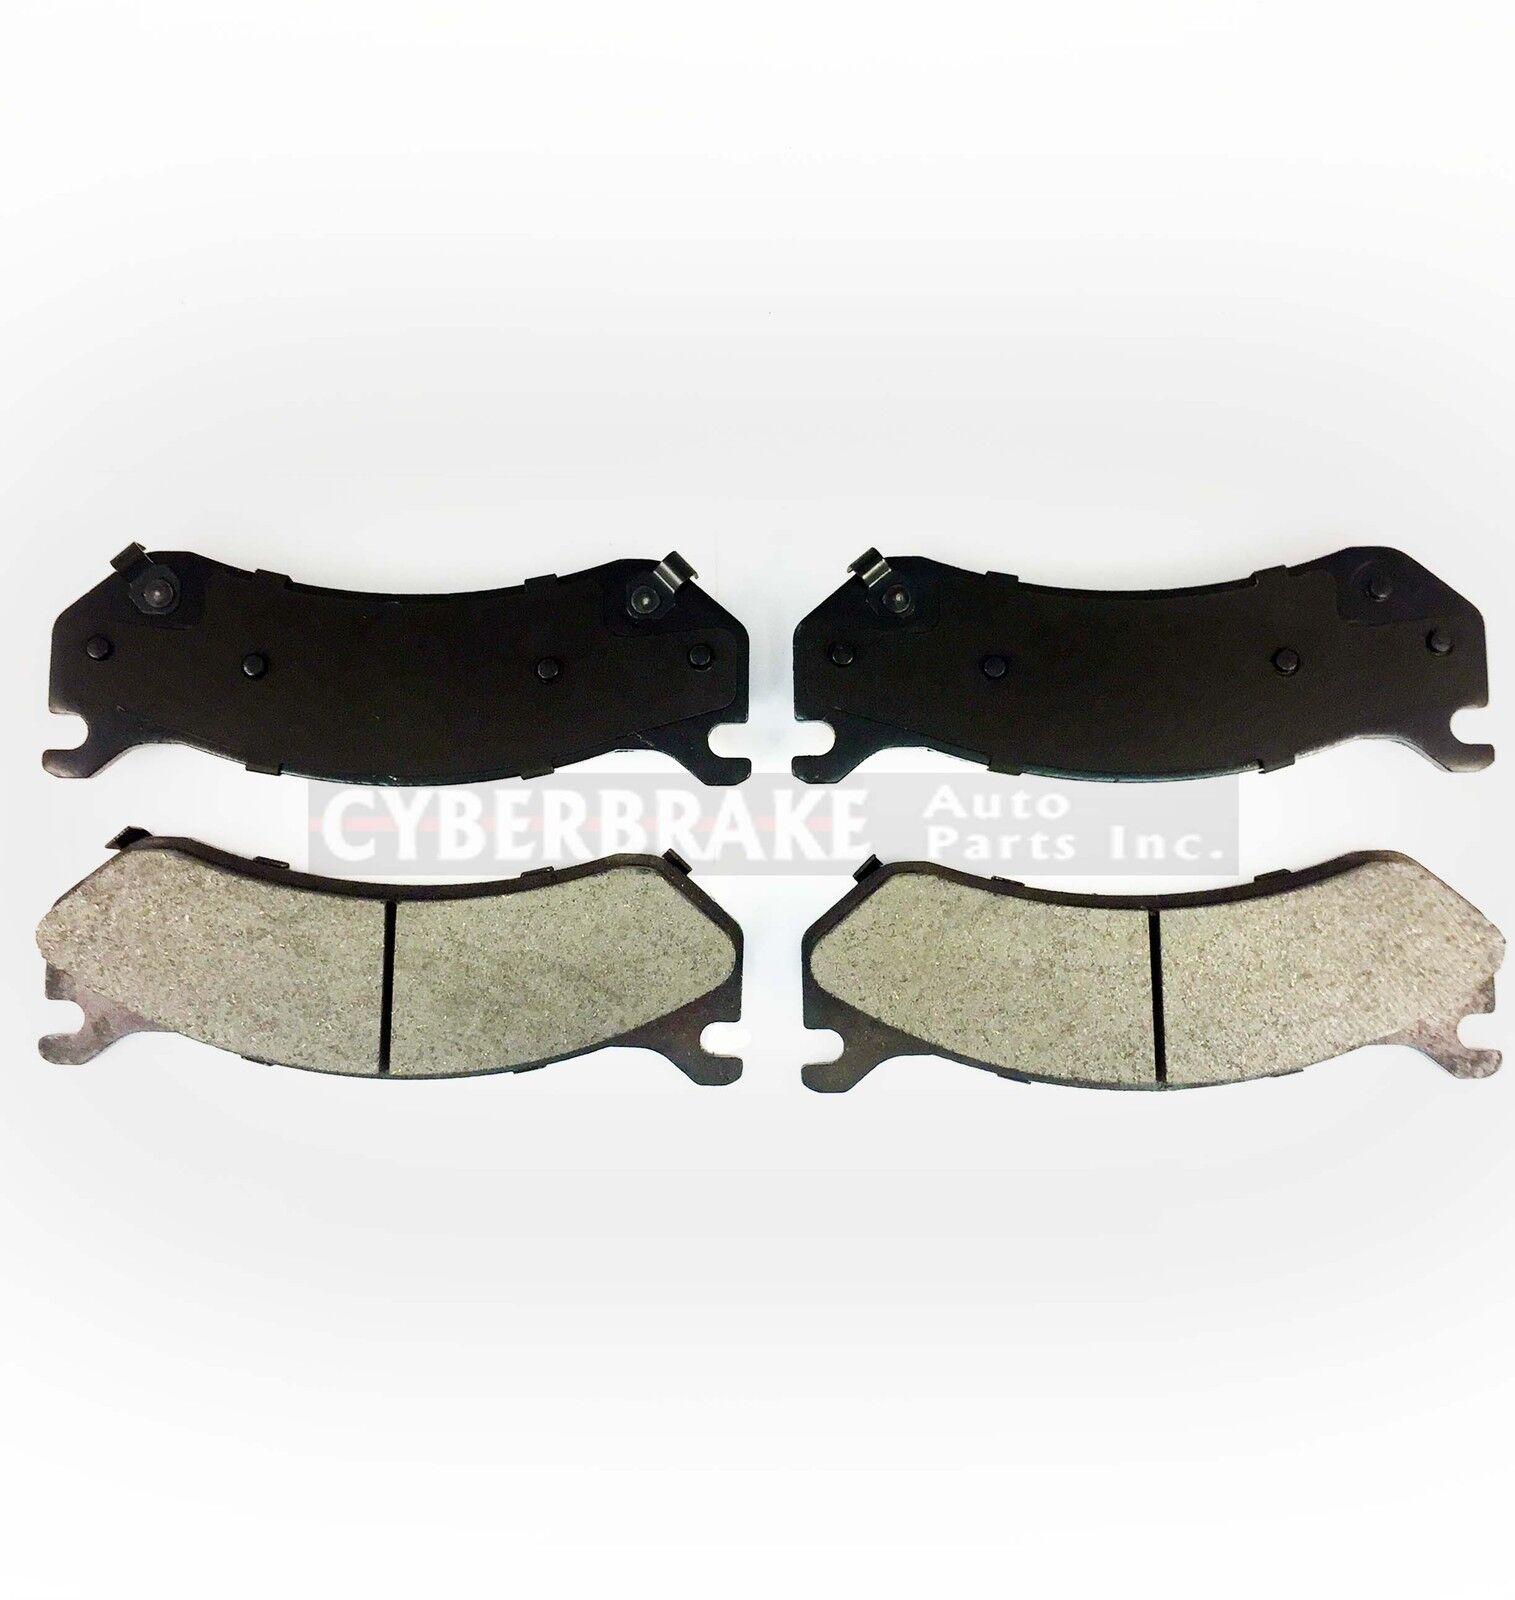 PCD784 FRONT Premium Ceramic Brake Pads Fits 07 Chevrolet Silverado 3500 Classic